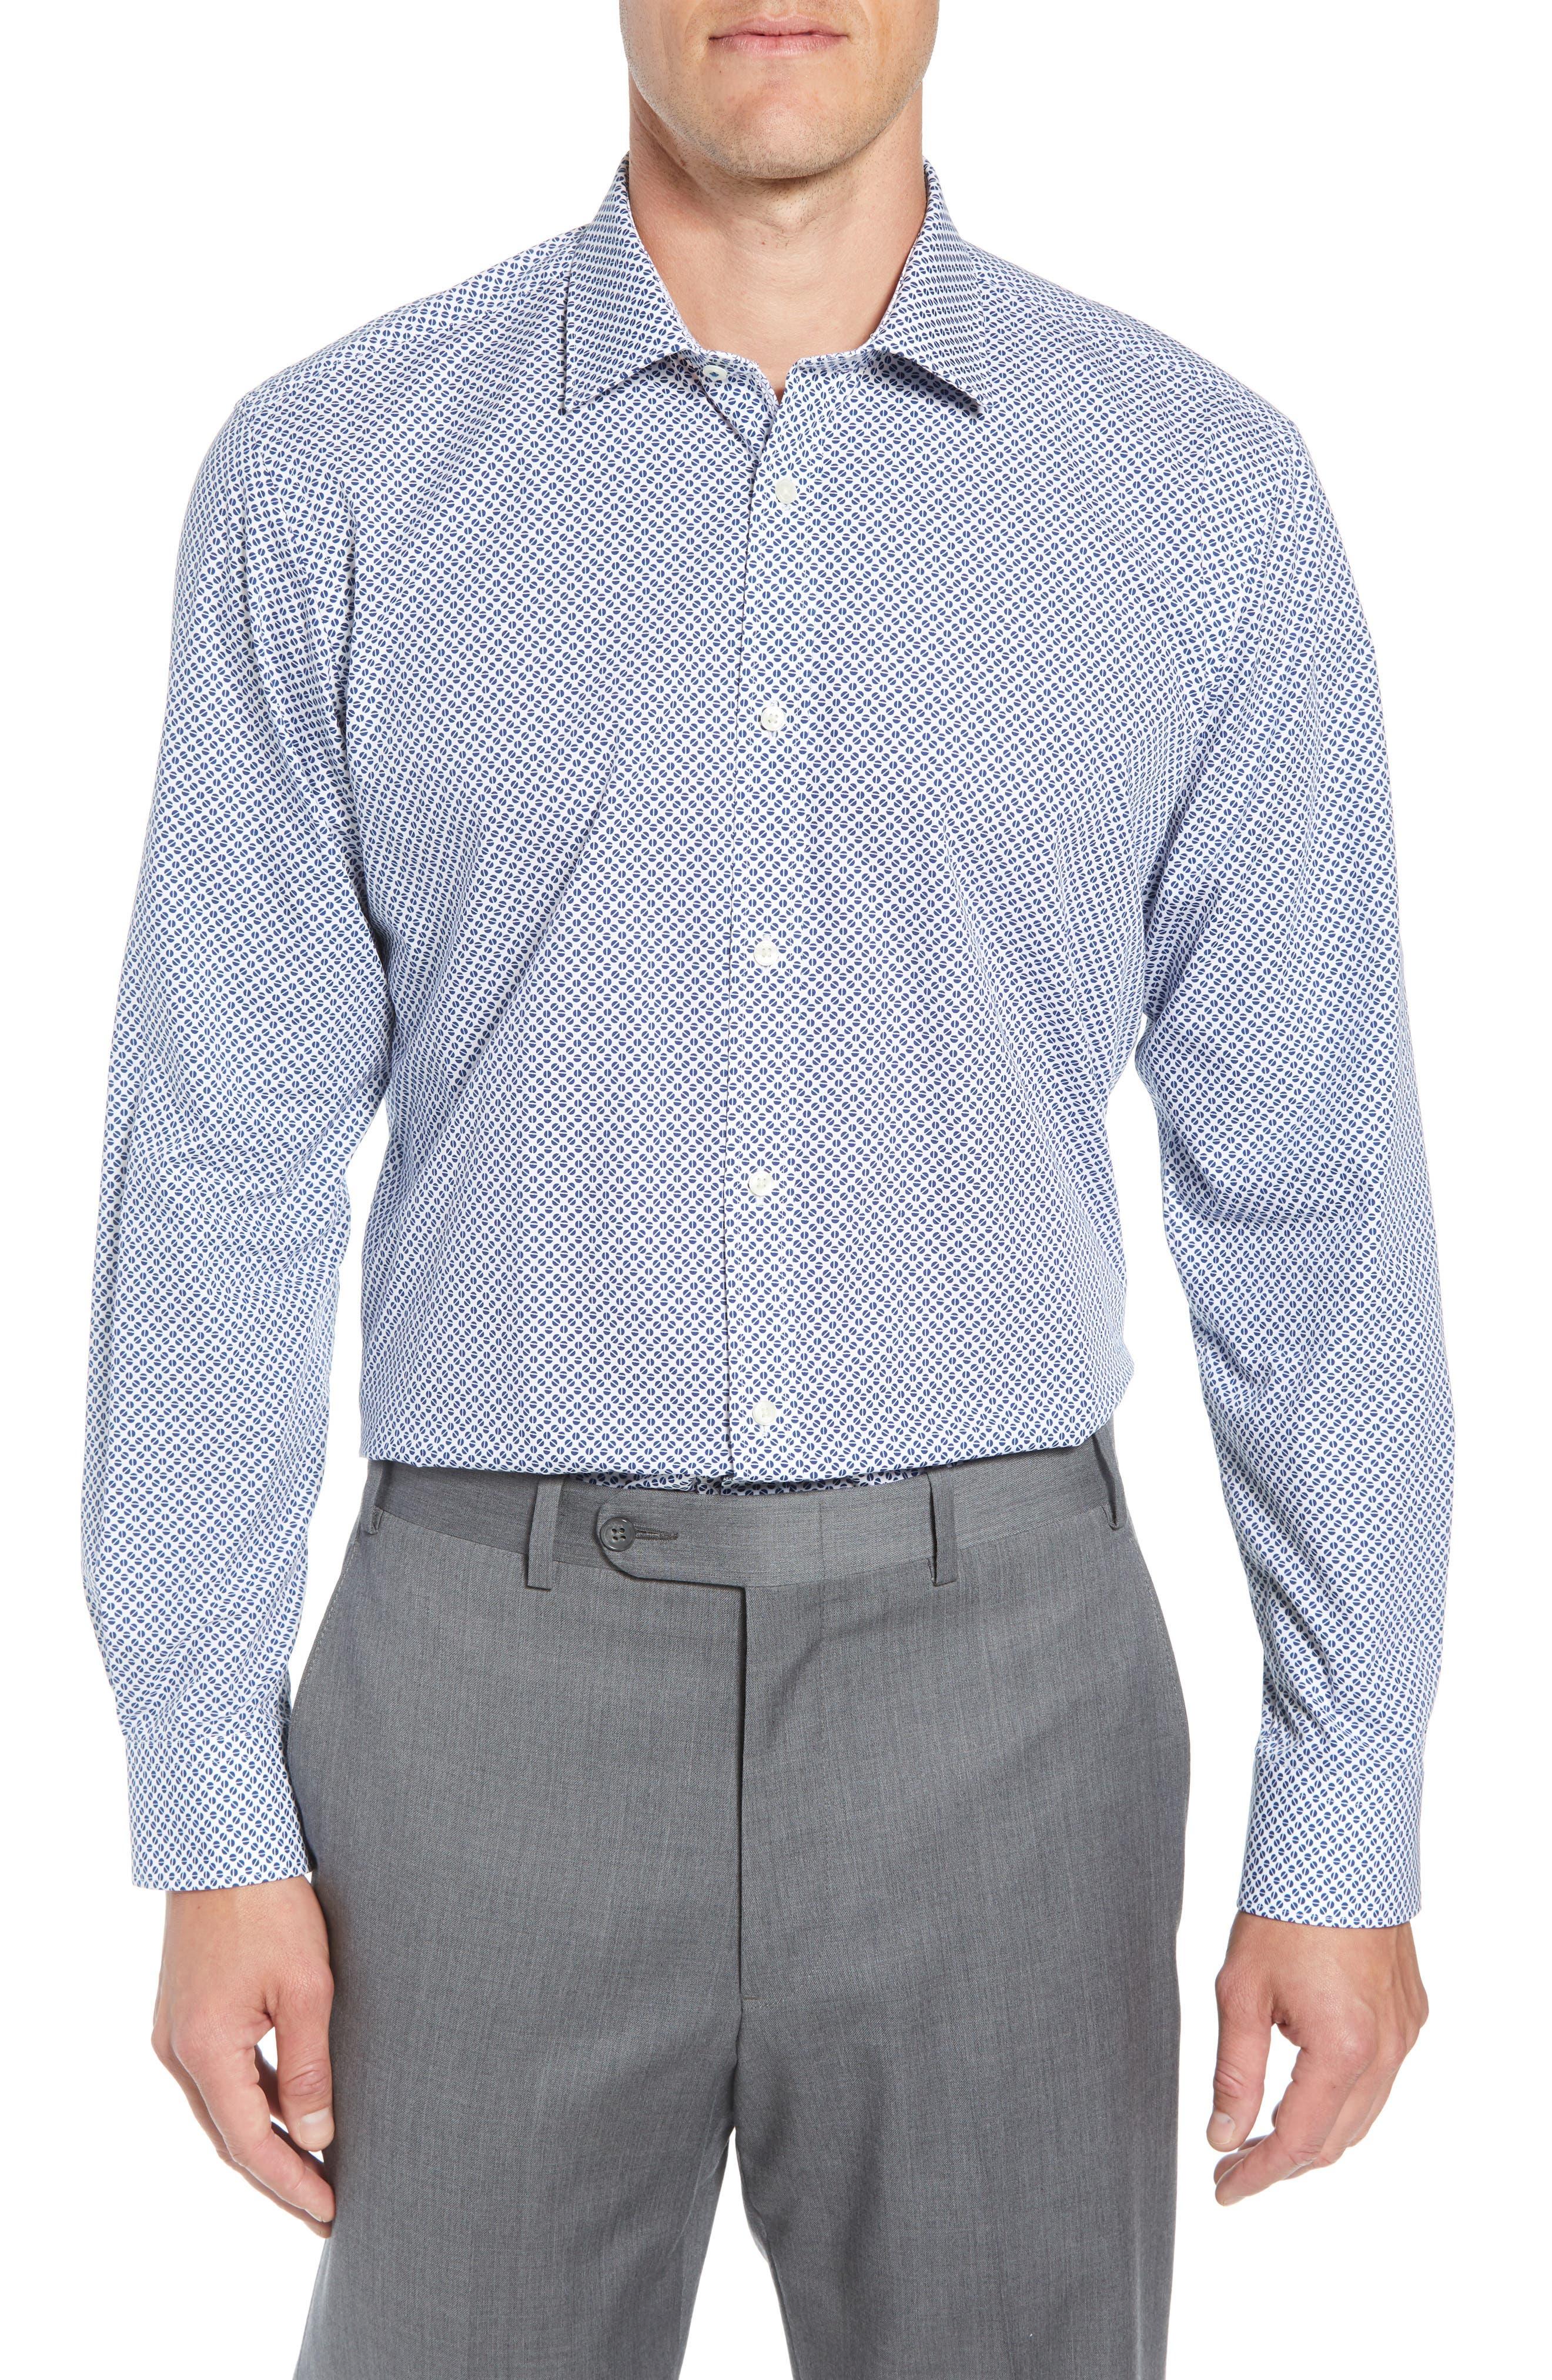 Maratha Trim Fit Print Dress Shirt,                             Main thumbnail 1, color,                             WHITE/ BLUE